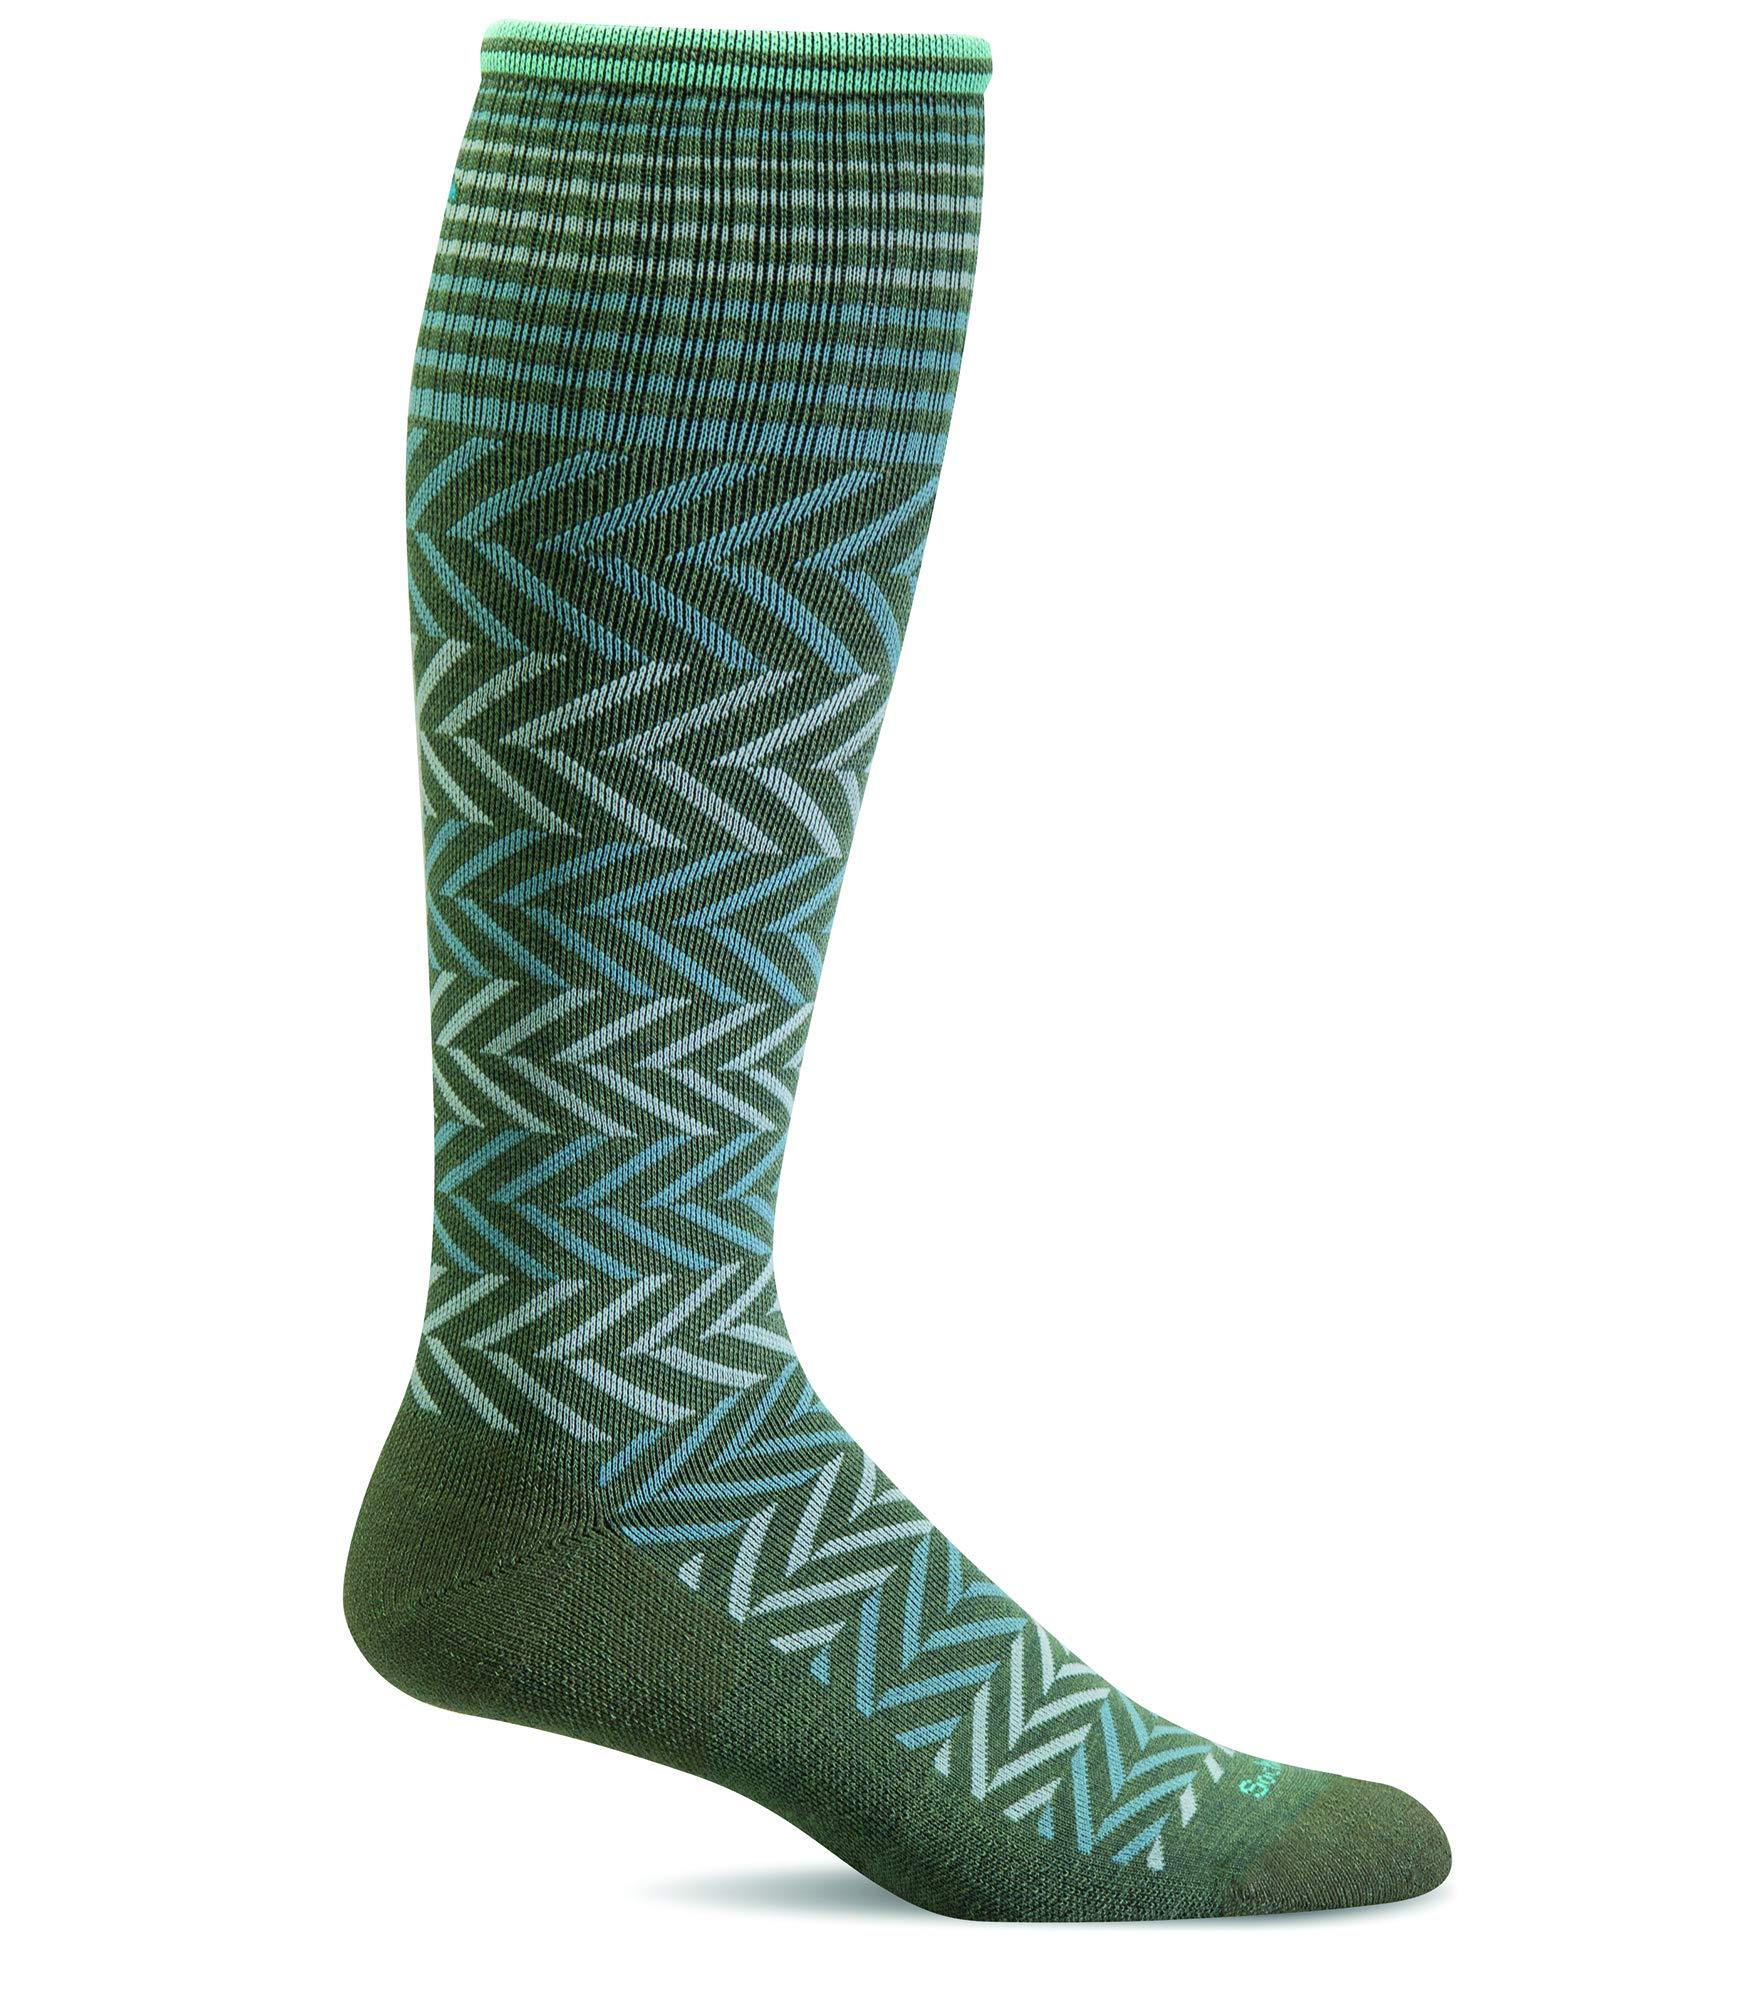 Sockwell Women's Chevron Moderate Compression Socks (Eucalyptus, M/L)